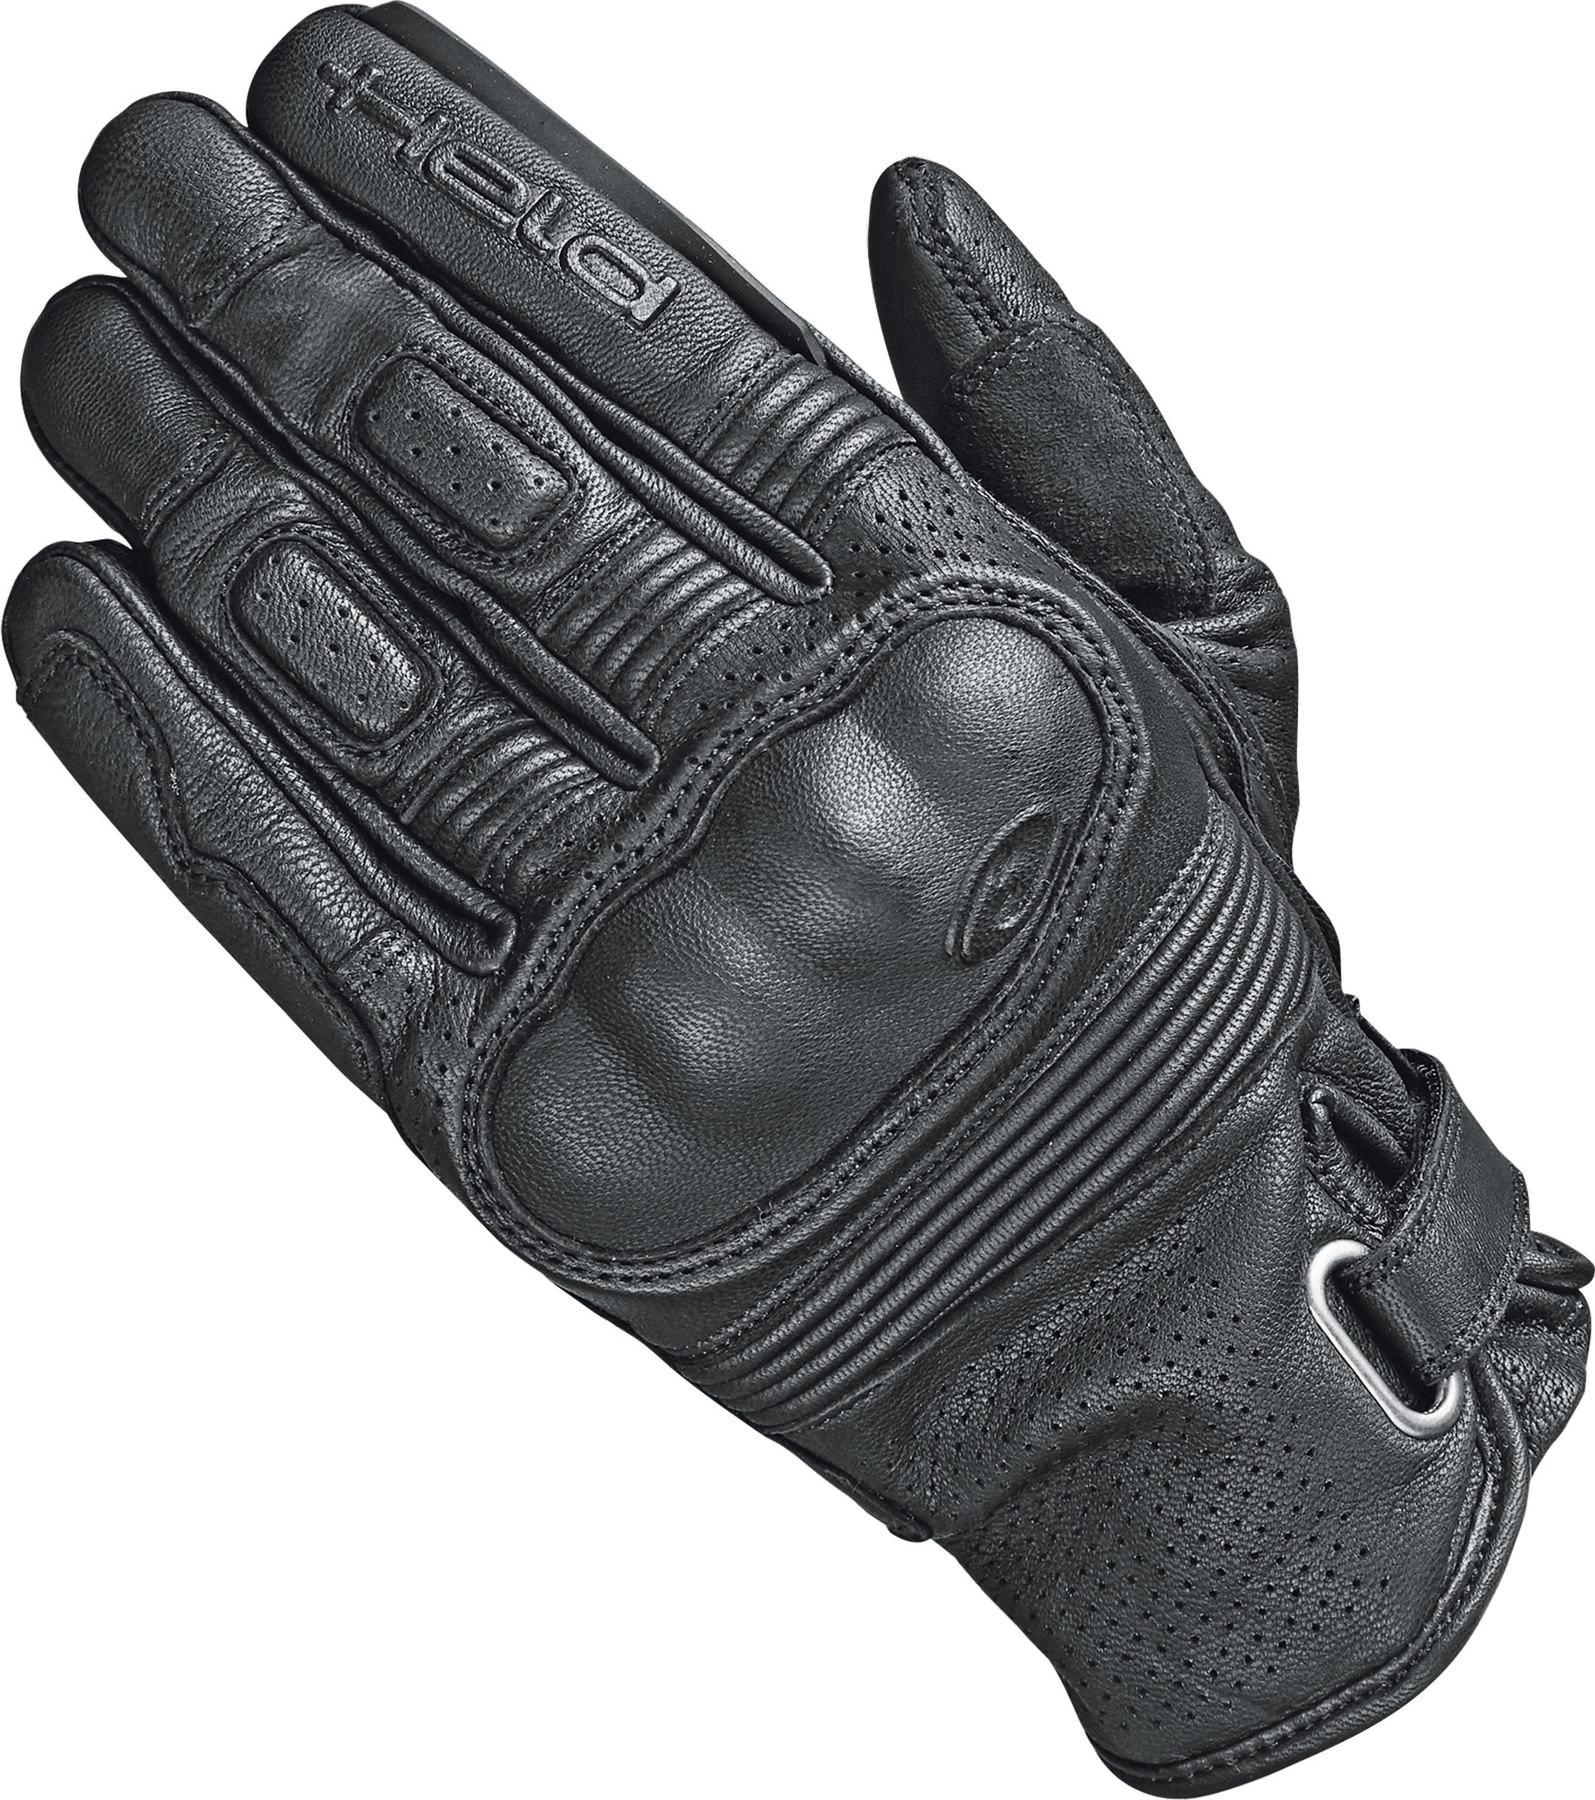 Black//White Held Travel 5 Leather Motorcycle Motorbike Touring Gloves